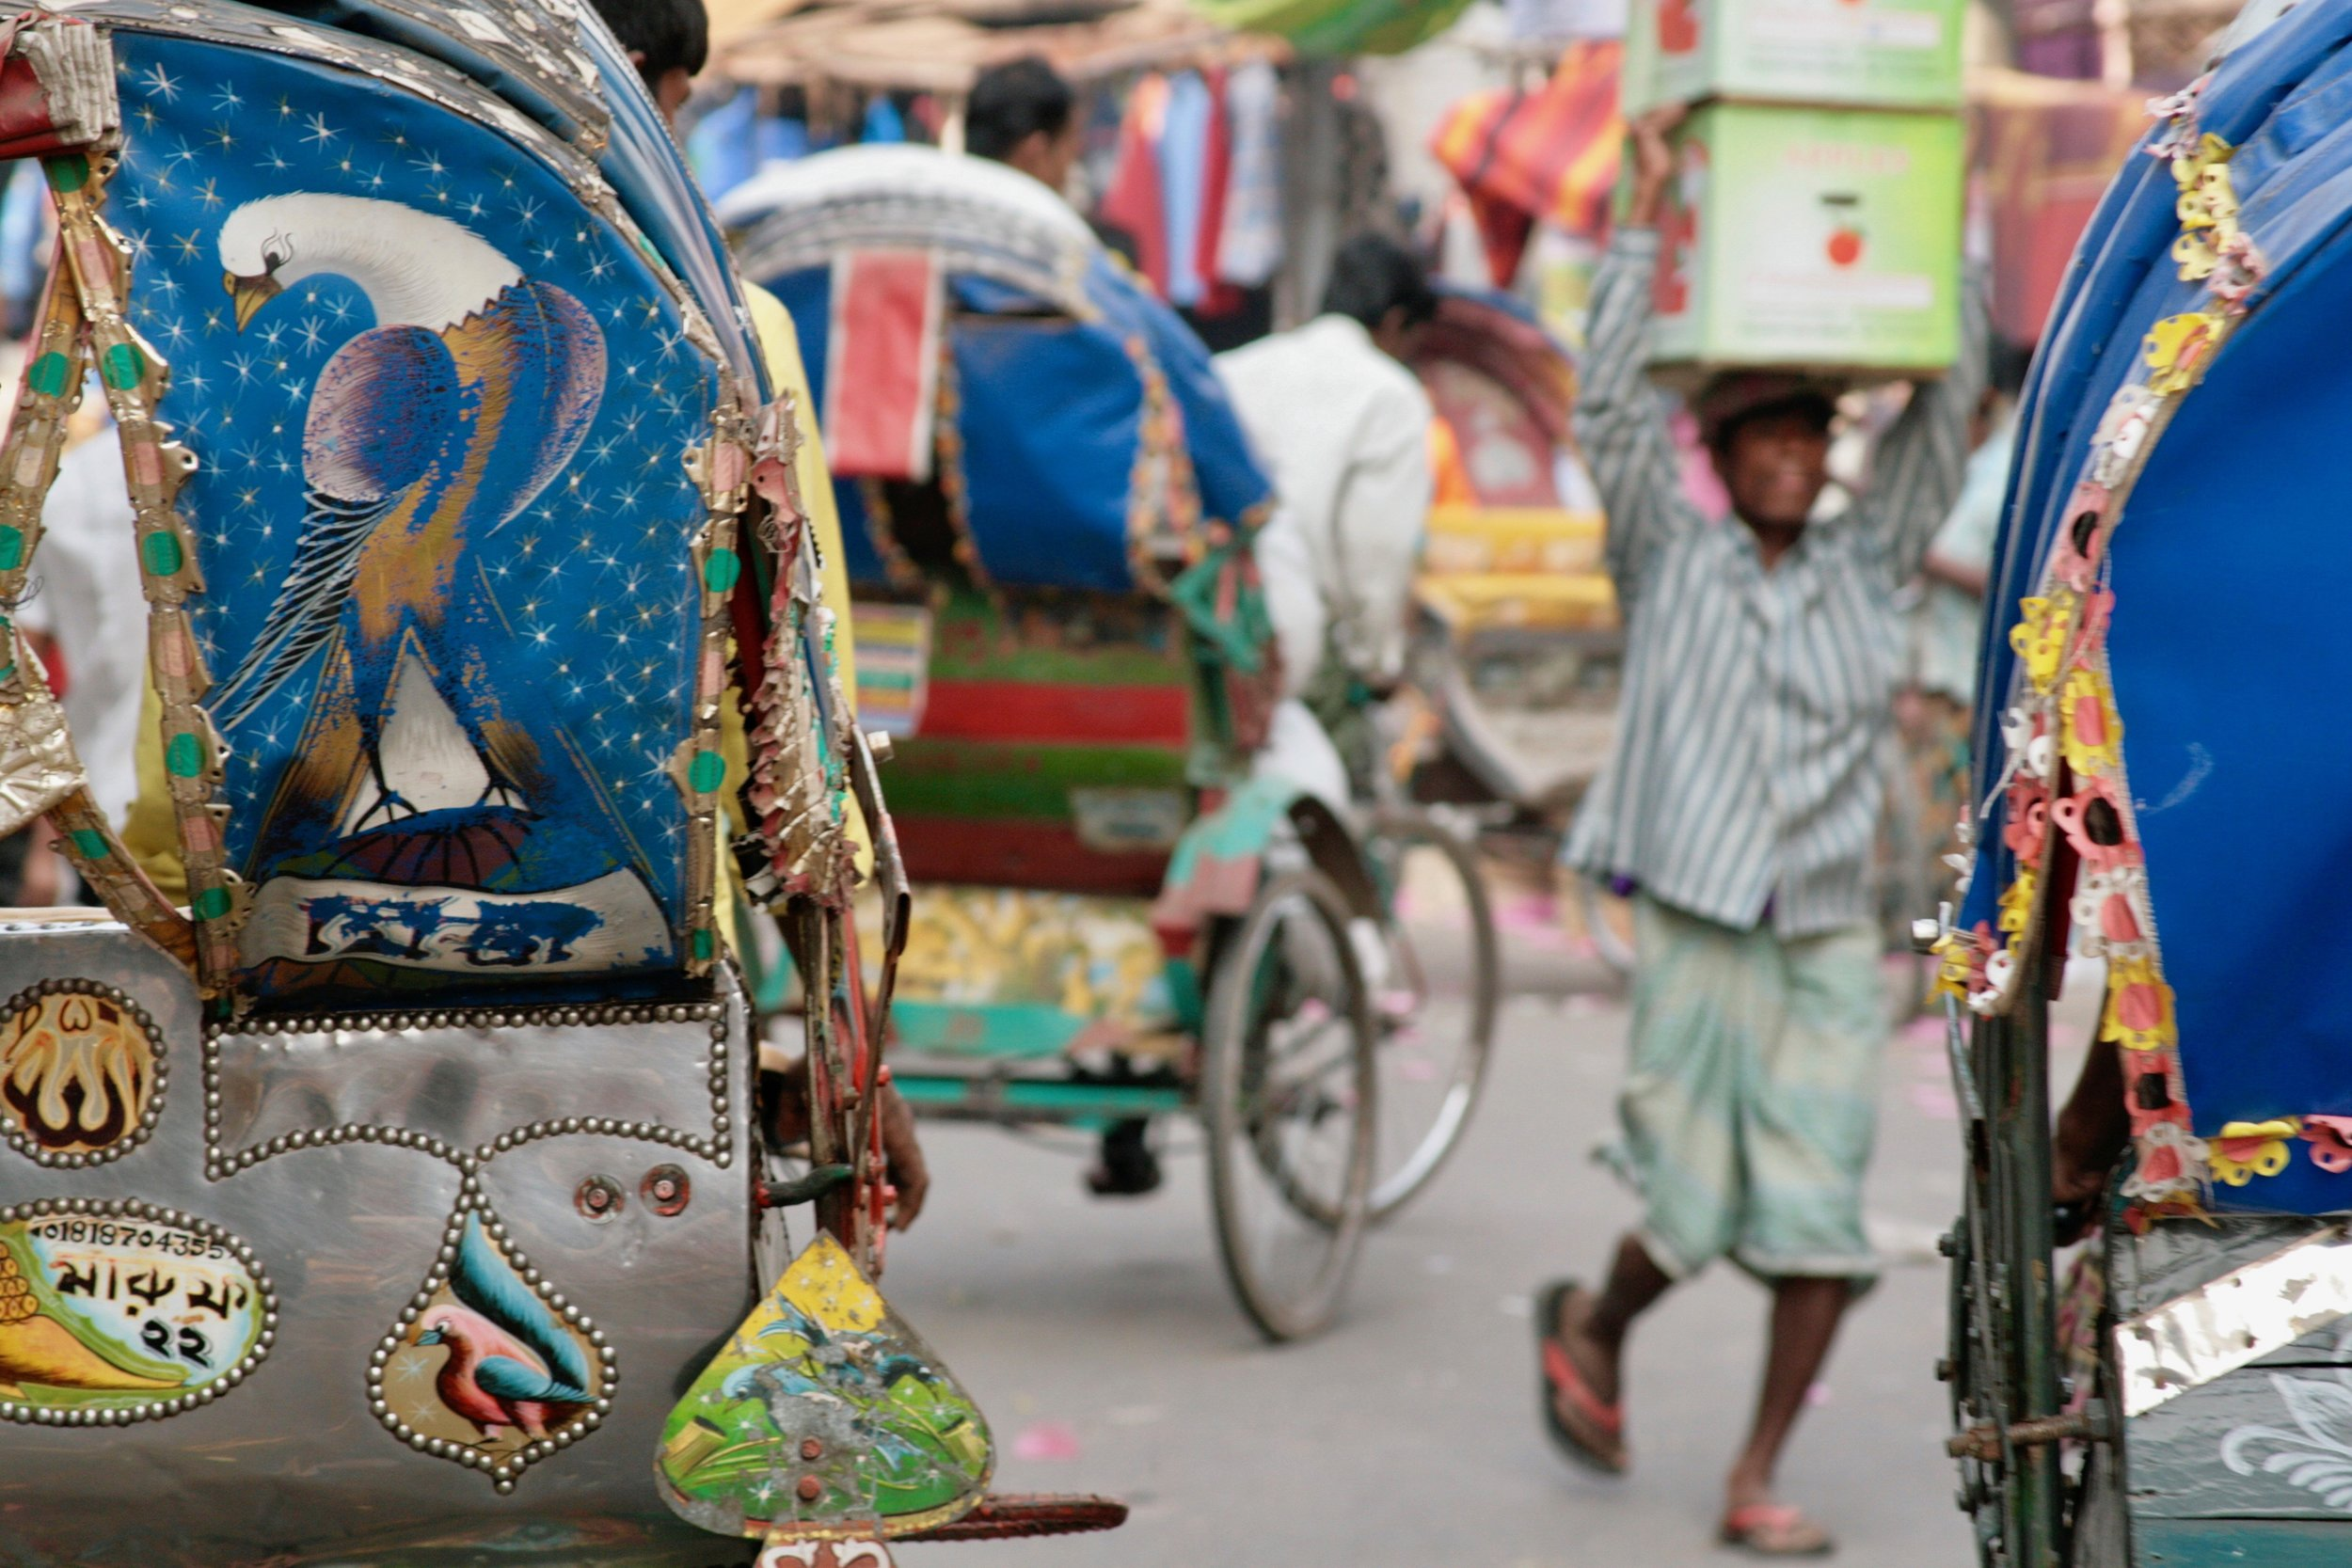 Places-Dhaka Street.jpg